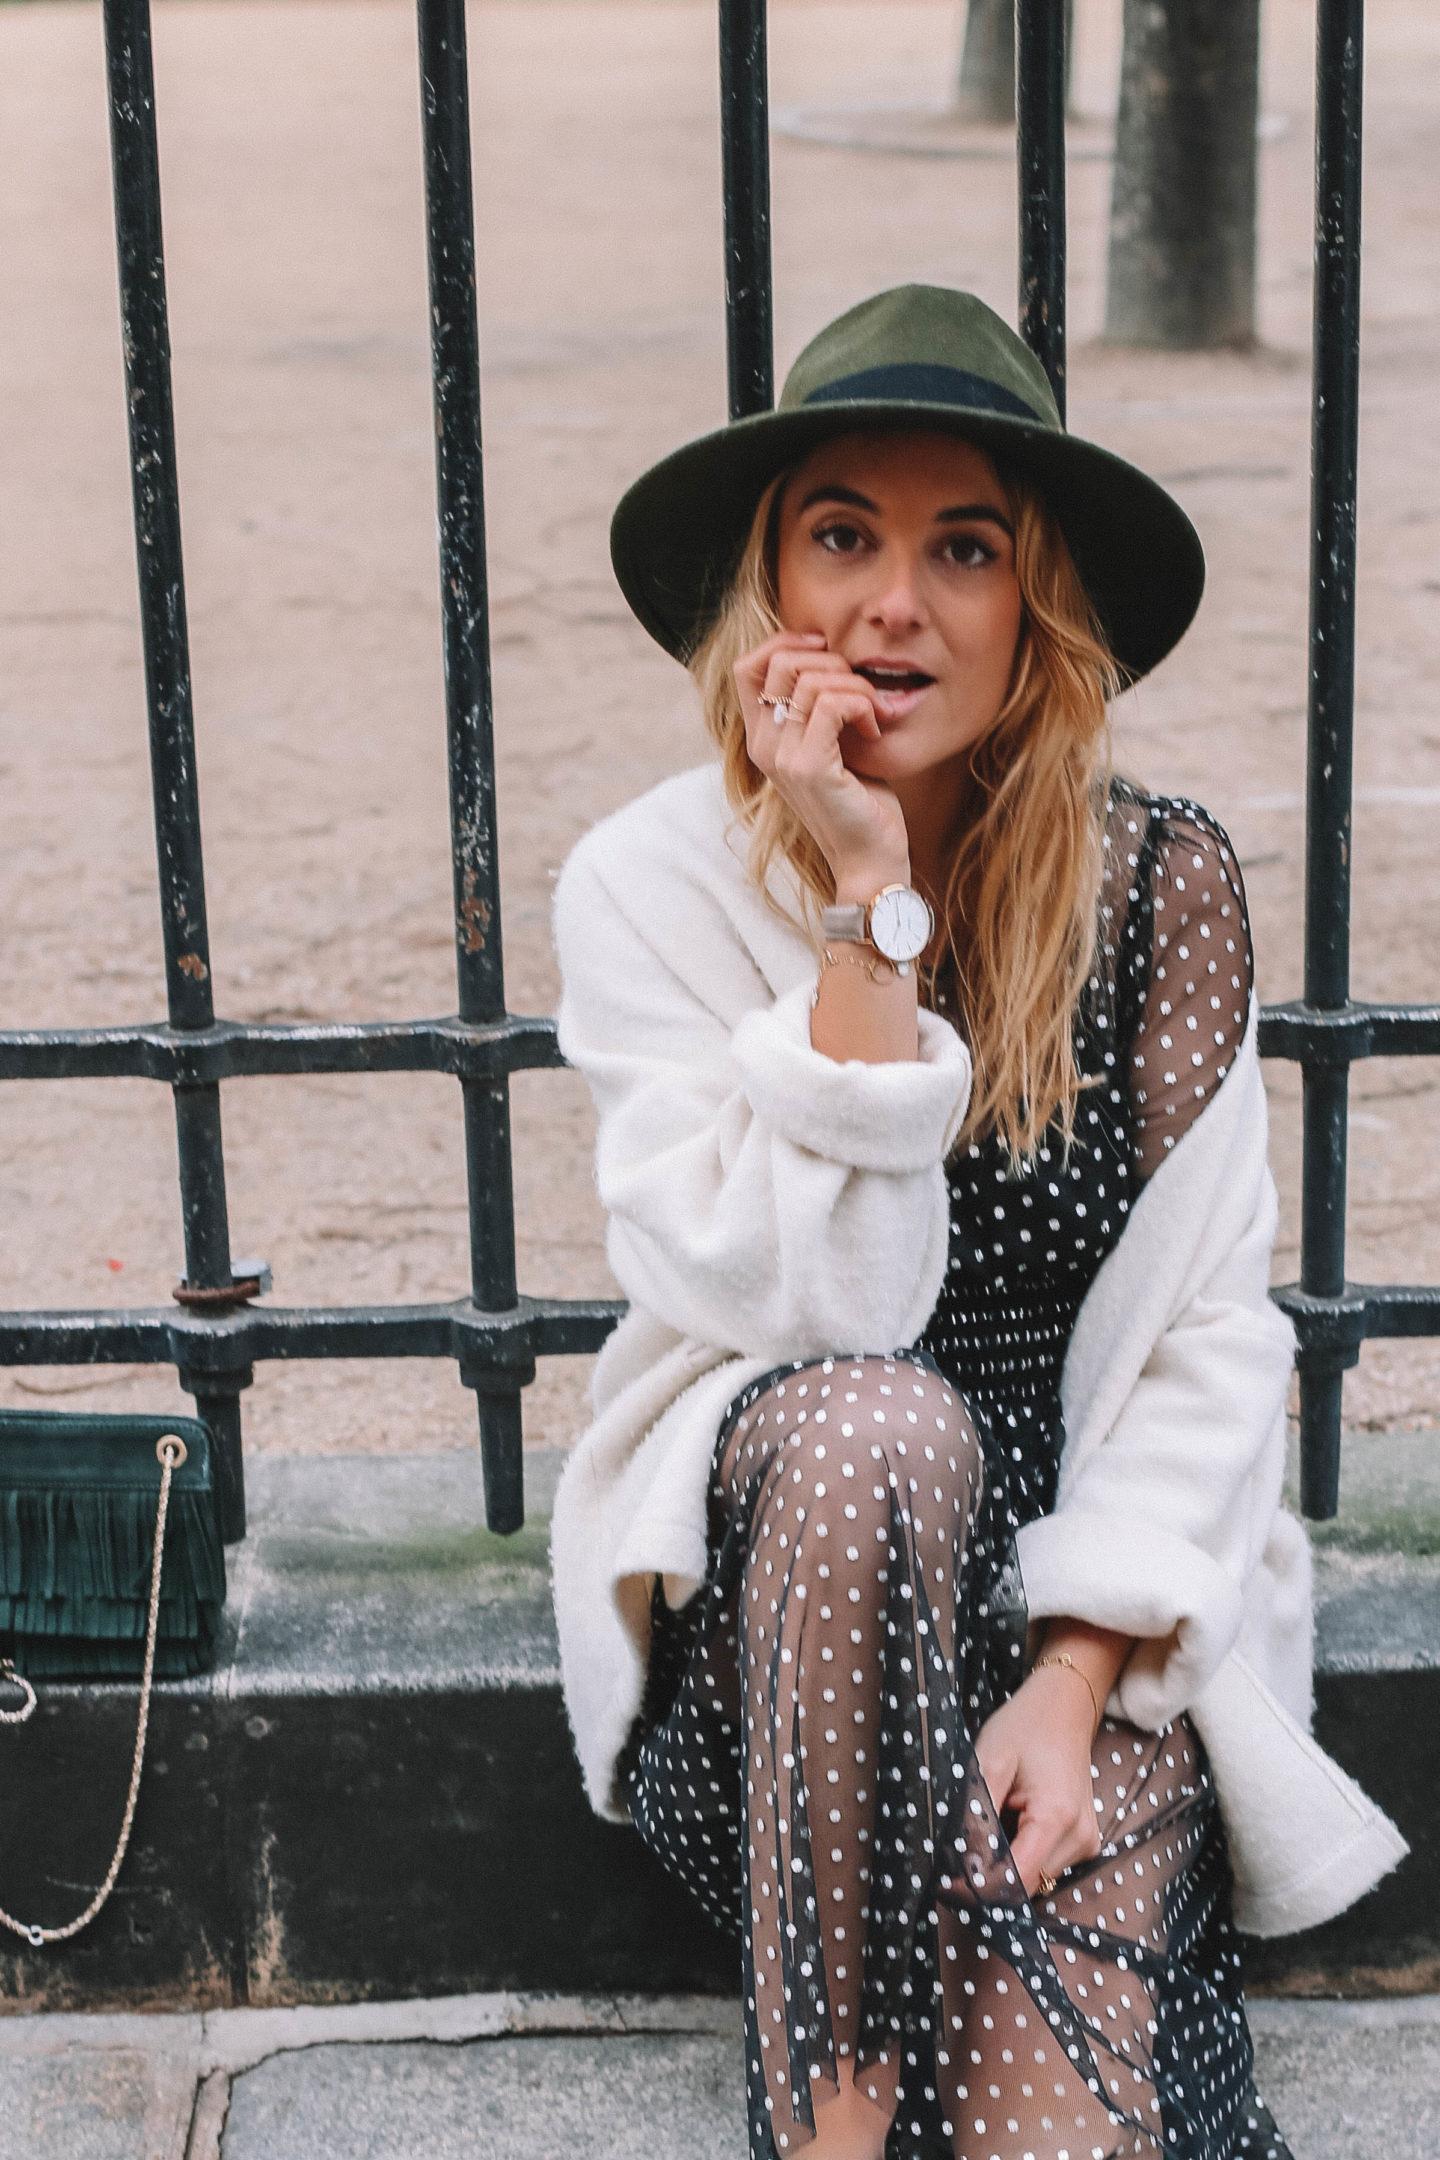 Sac Sézane - Blondie Baby blog mode et voyages